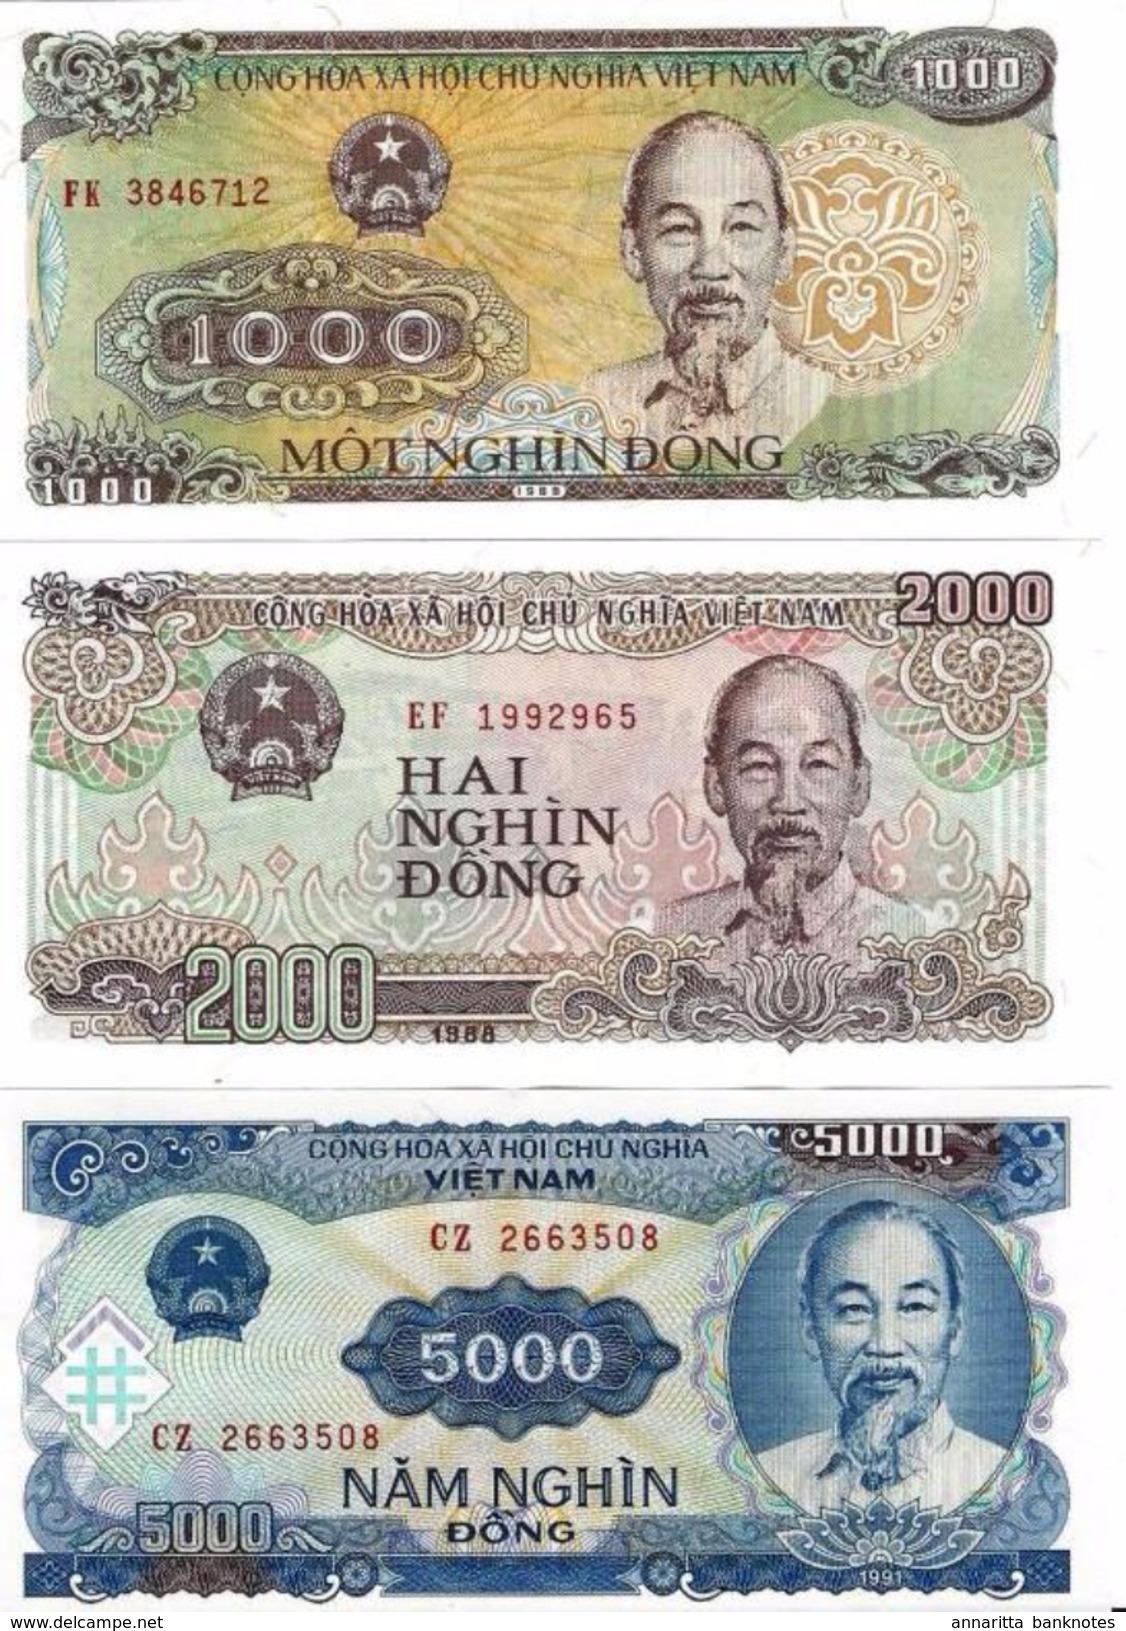 VIETNAM 1000 2000 5000 DONG 1988-1991 P-106,107,108 UNC SET [VN334-336] - Vietnam